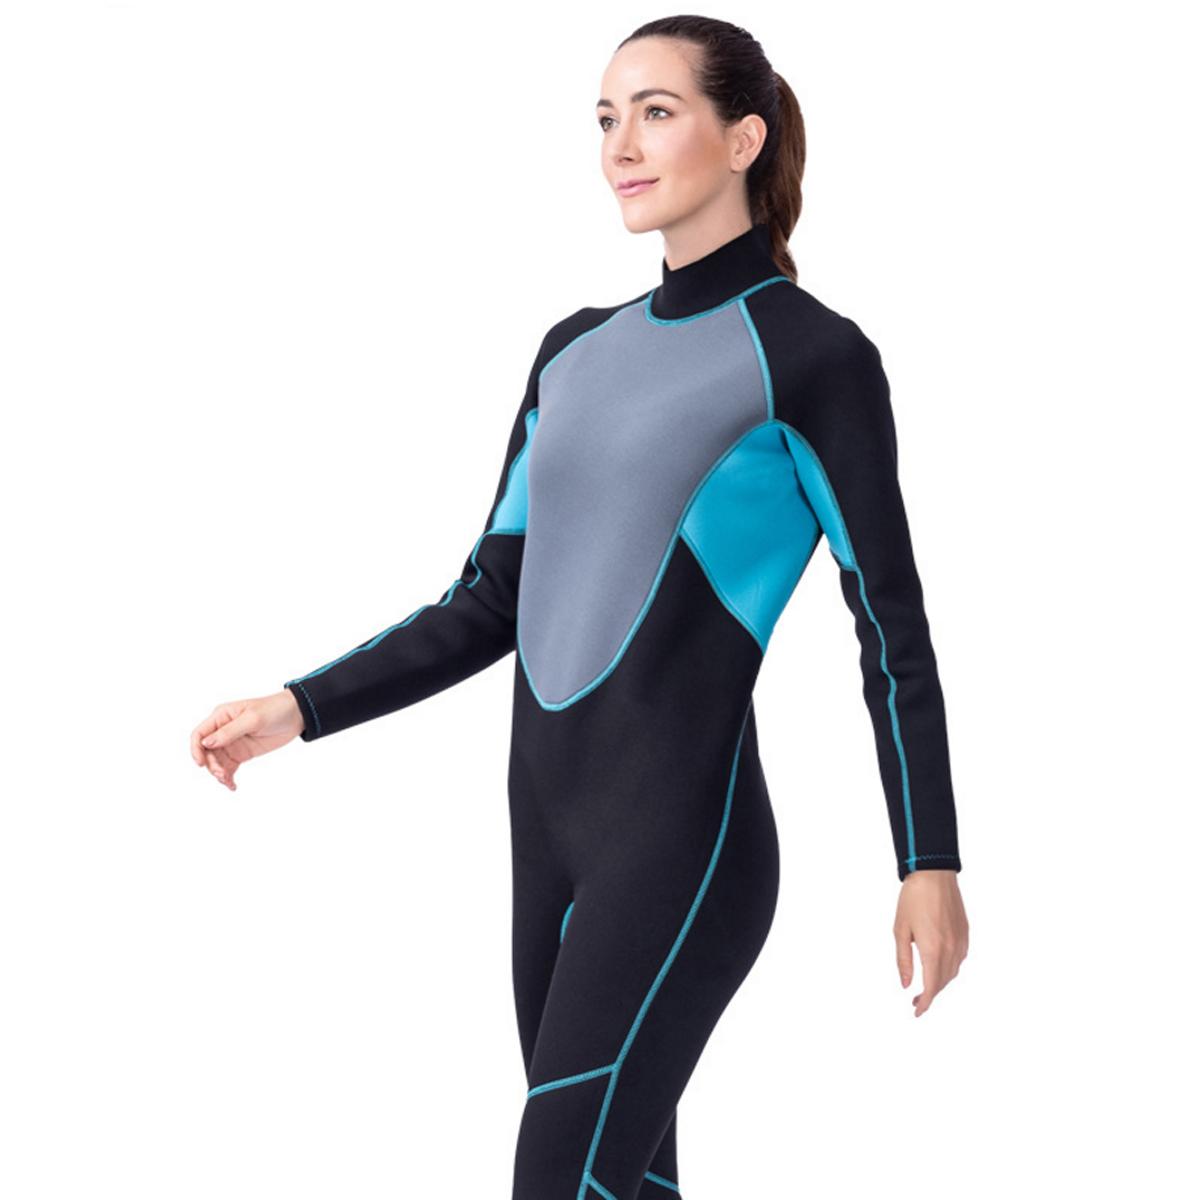 Details about WOMEN Wetsuit 3MM Full Body Suit Super Stretch Diving Suit  Swim Surf Snorkeling 457b591ca